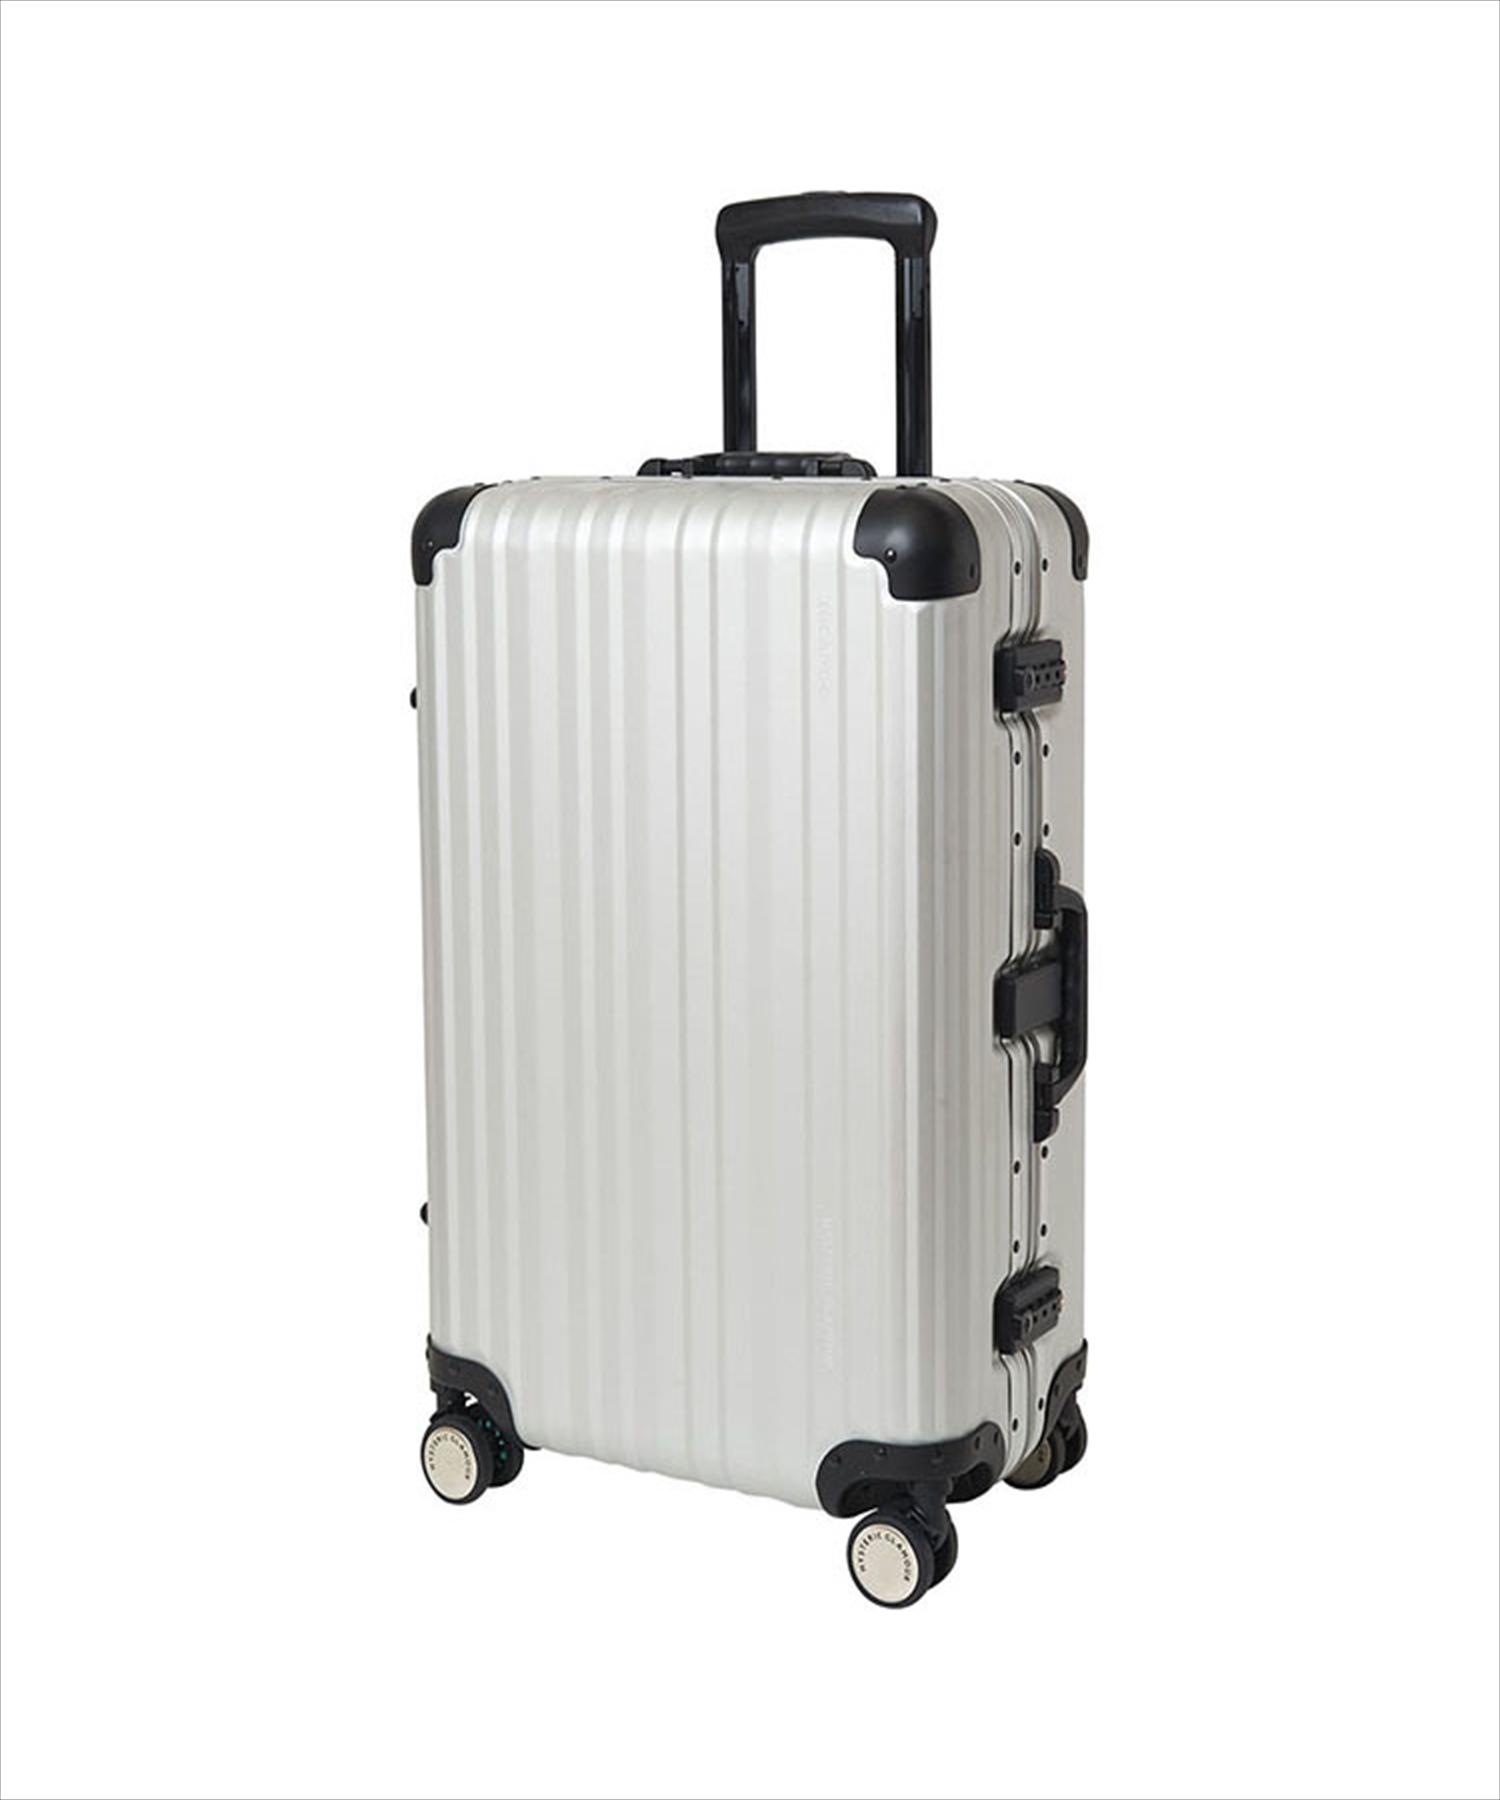 RICARDO×HYSTERIC GLAMOUR/AILERON 58Lスーツケース